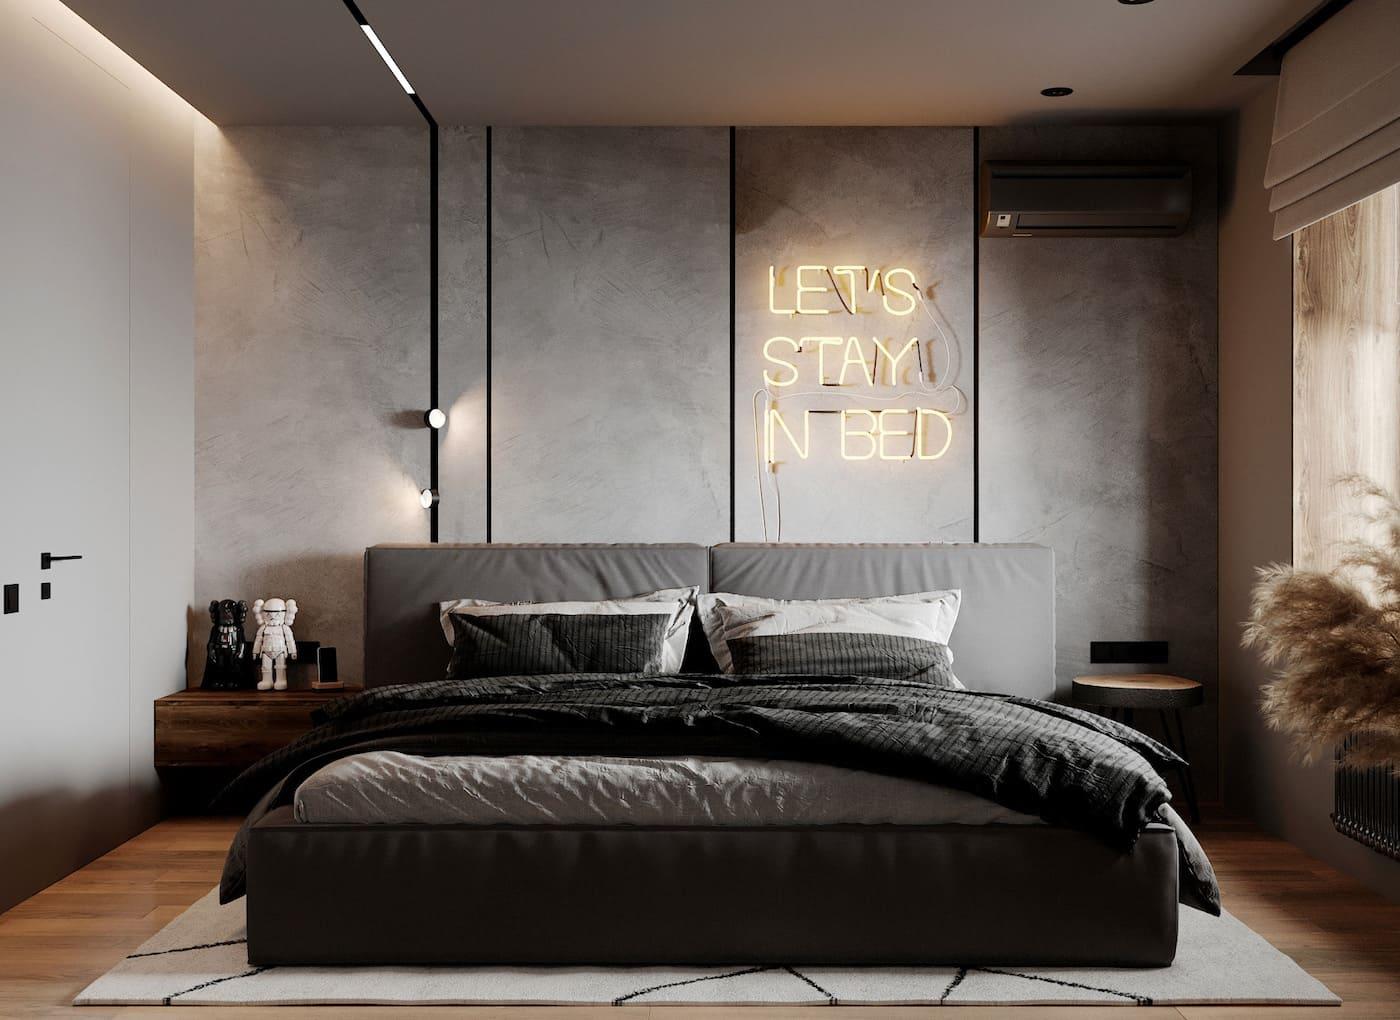 модный дизайн интерьера квартиры фото 57